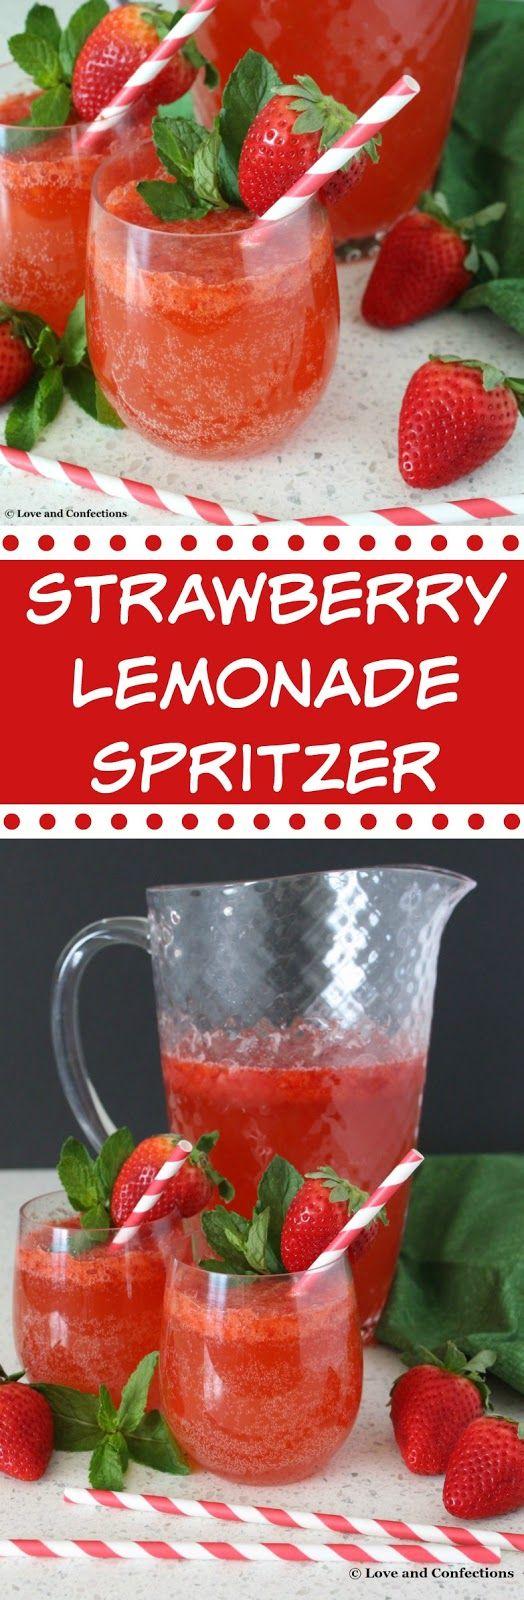 Strawberry Lemonade Spritzer from LoveandConfections.com